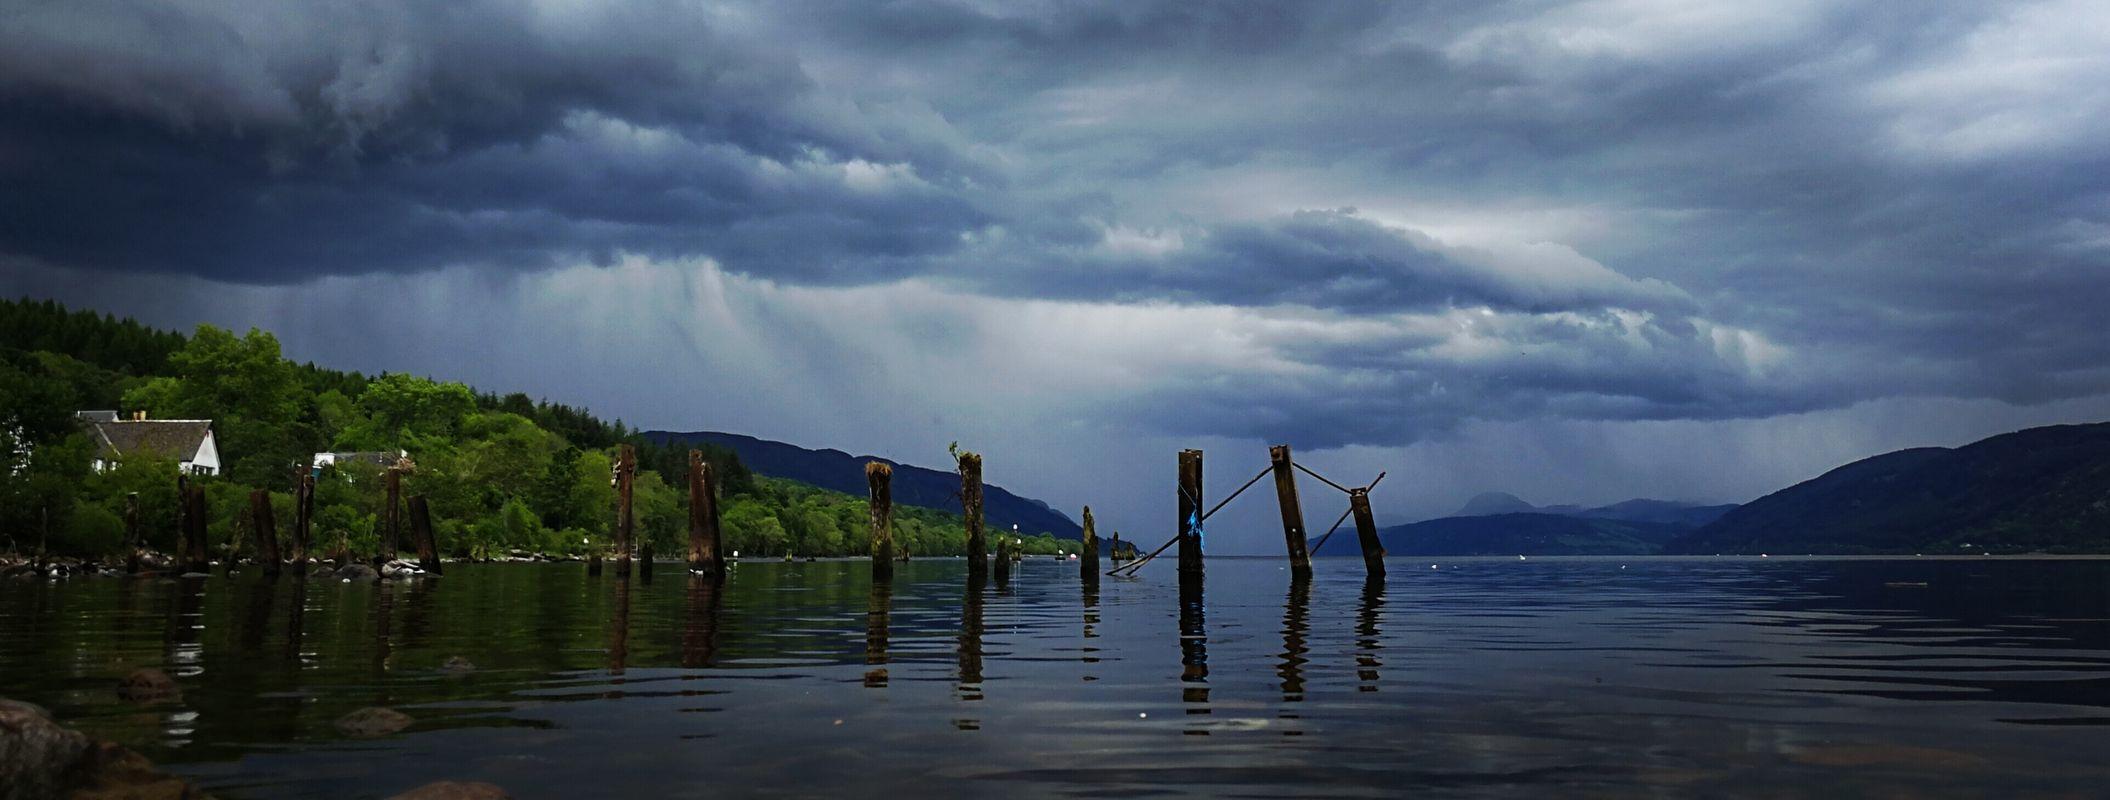 Storm over loch ness